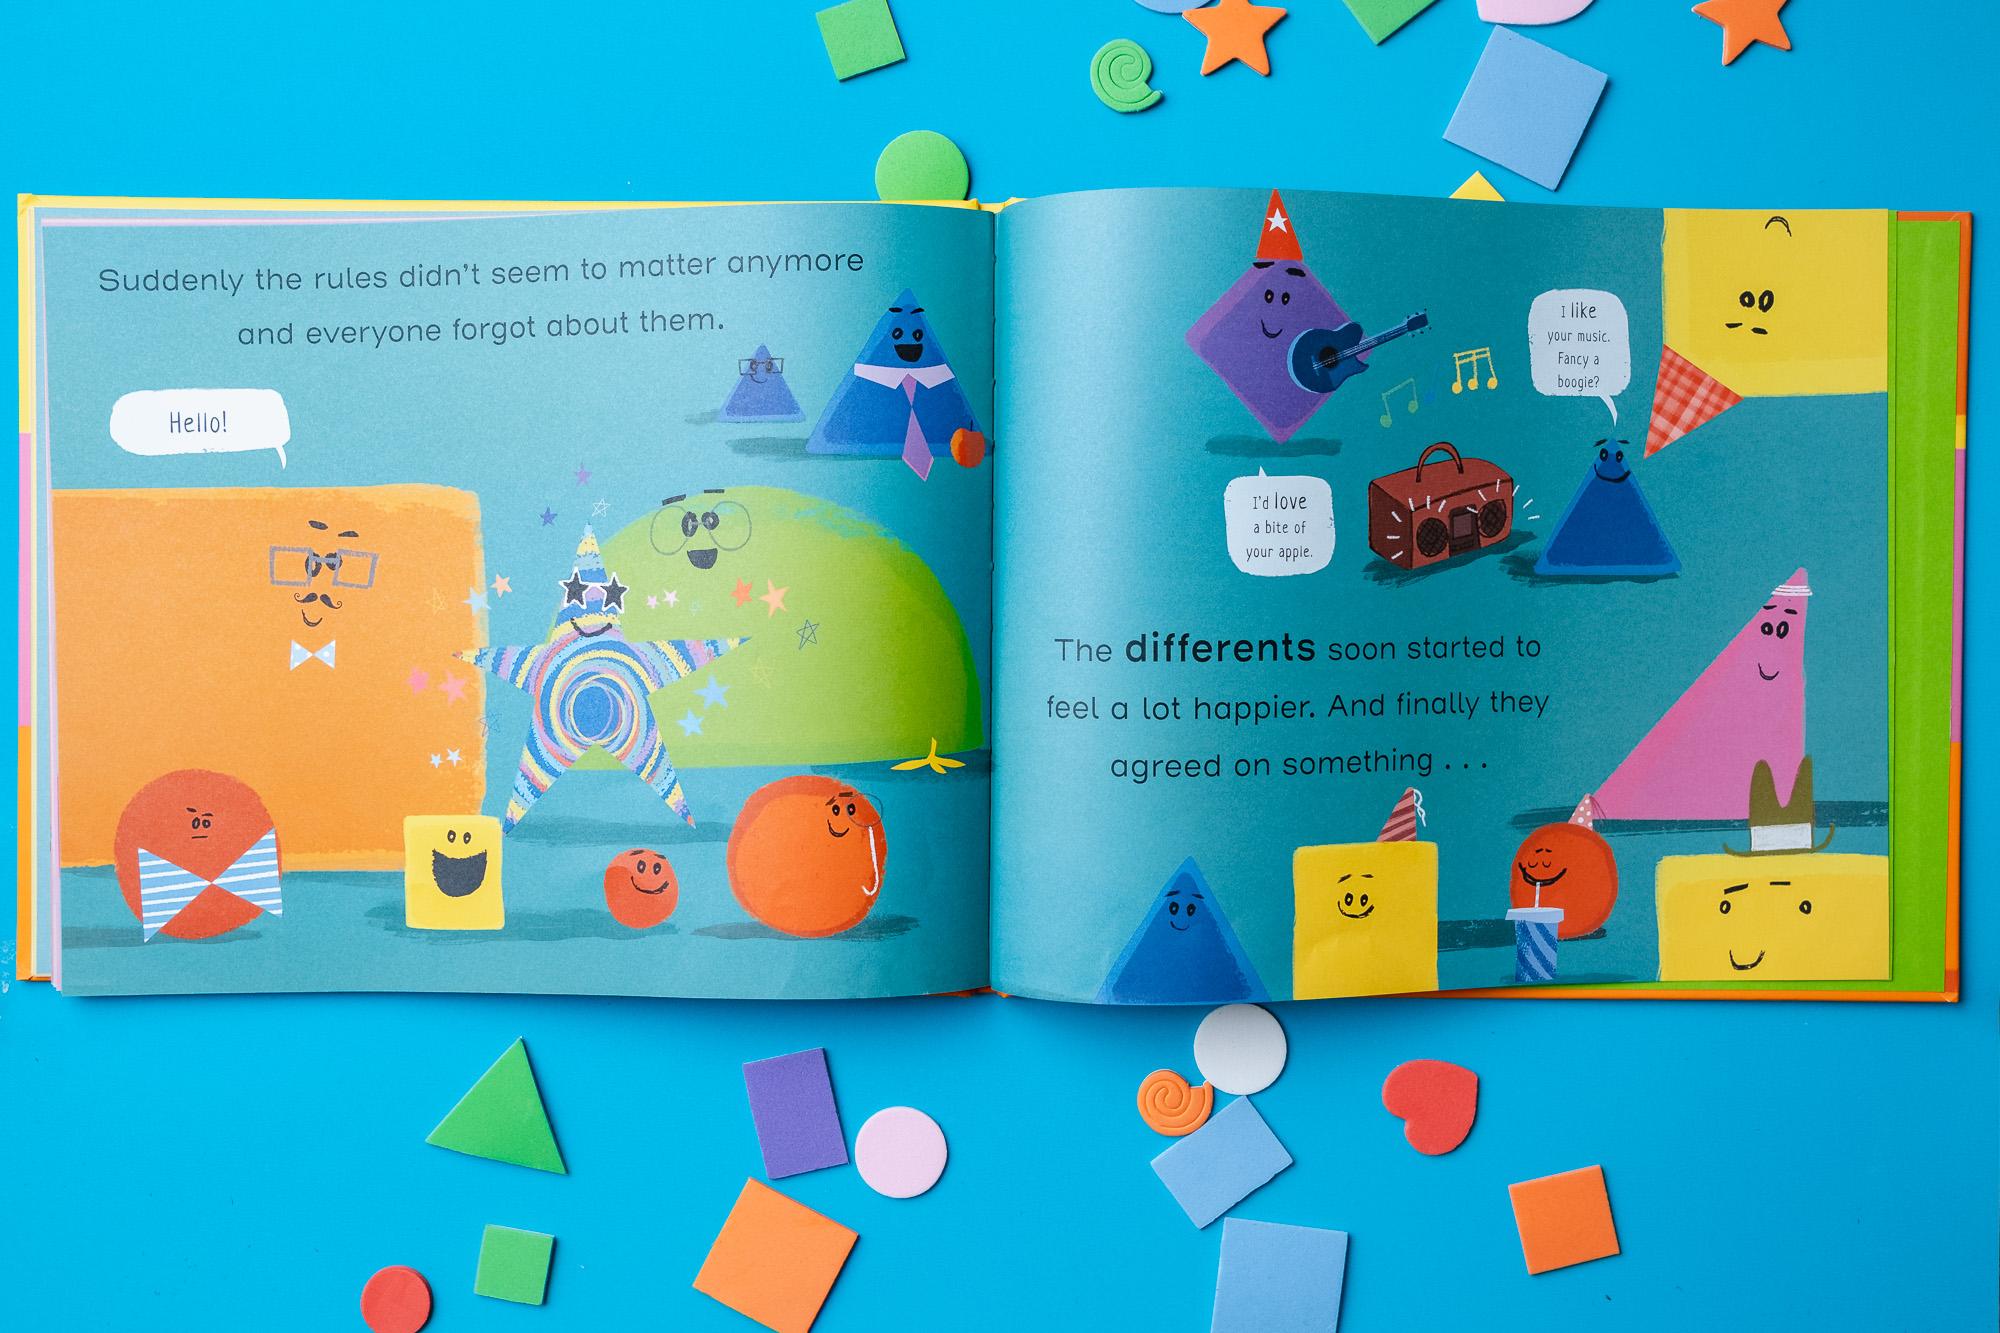 Rainbow_book_projecy-3.jpg